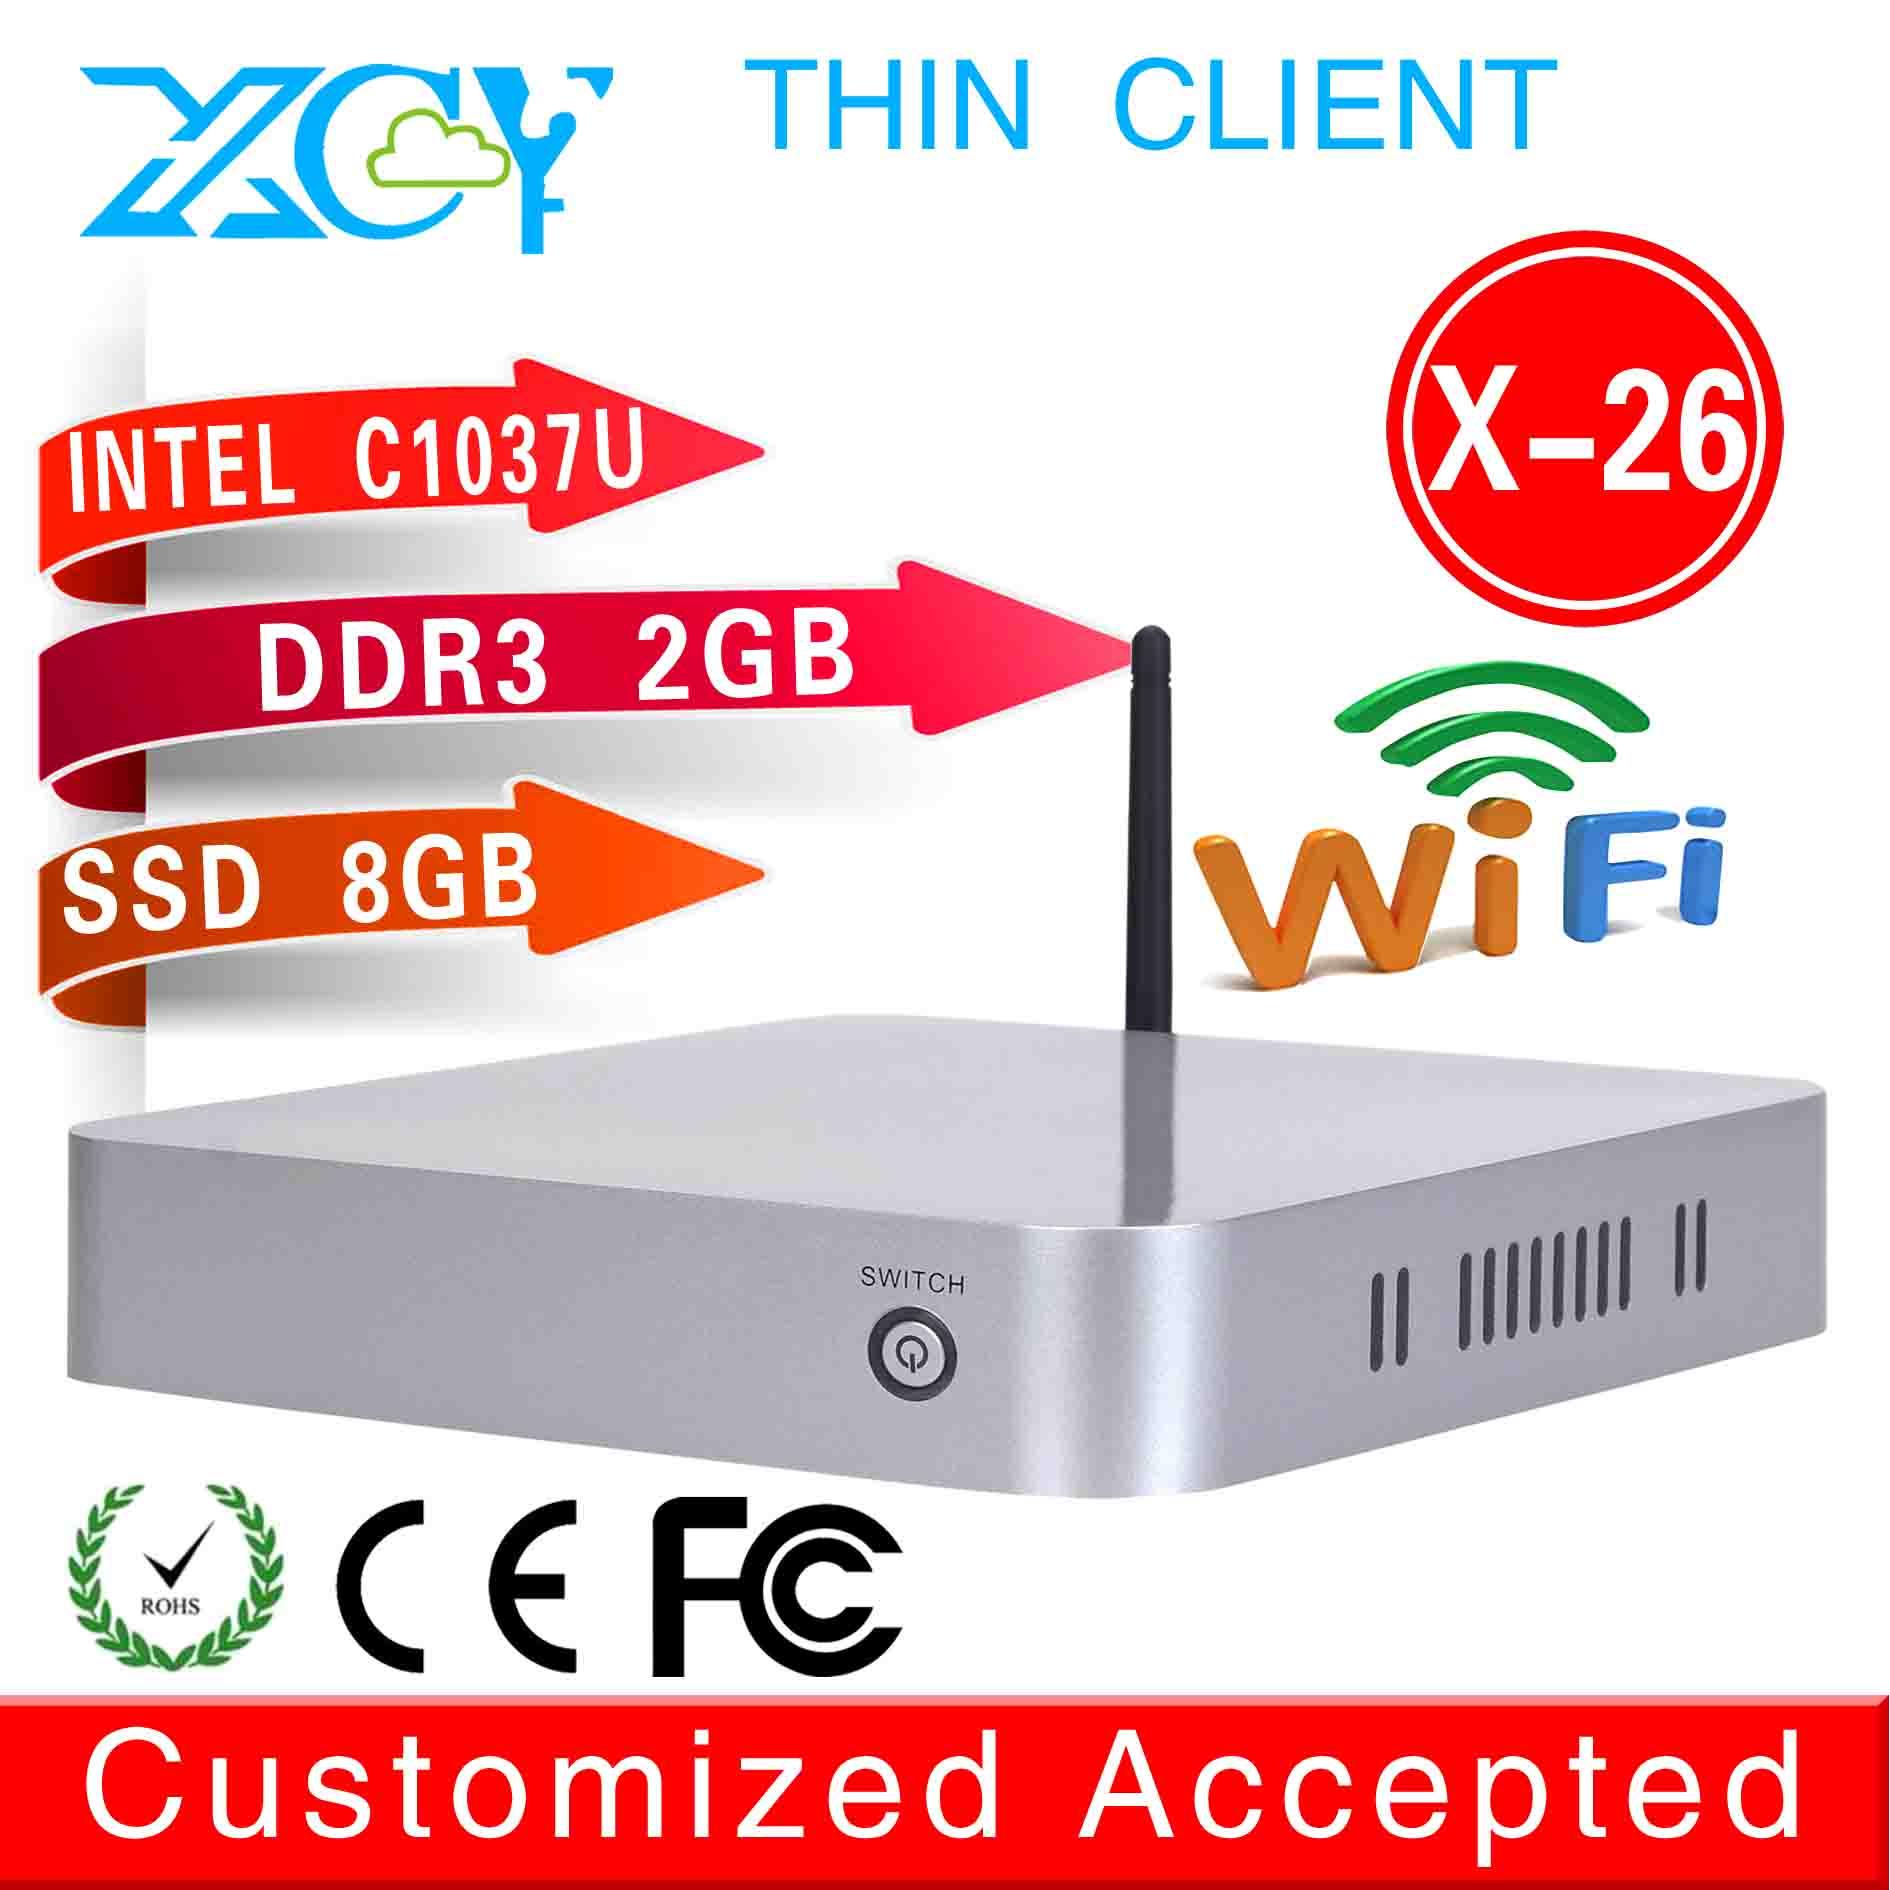 C1037u virtual computer C1037u Zero Client C1037u business PC x-26 2G RAM 8G SSD Video Resolution:1920*1080 Hot sale(China (Mainland))